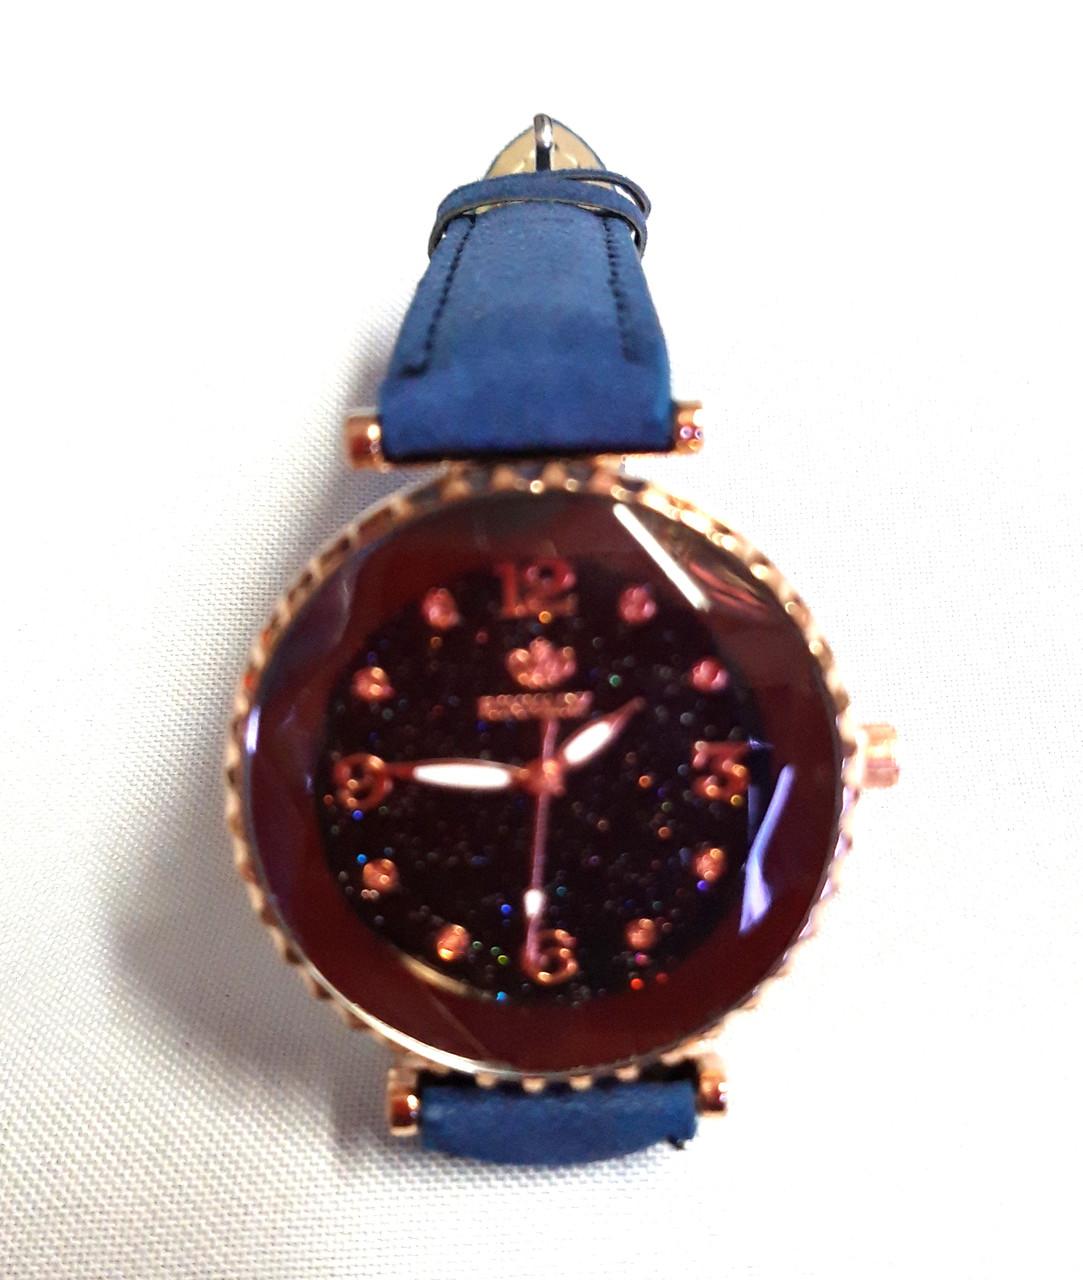 Женские часы, кварцевые синие